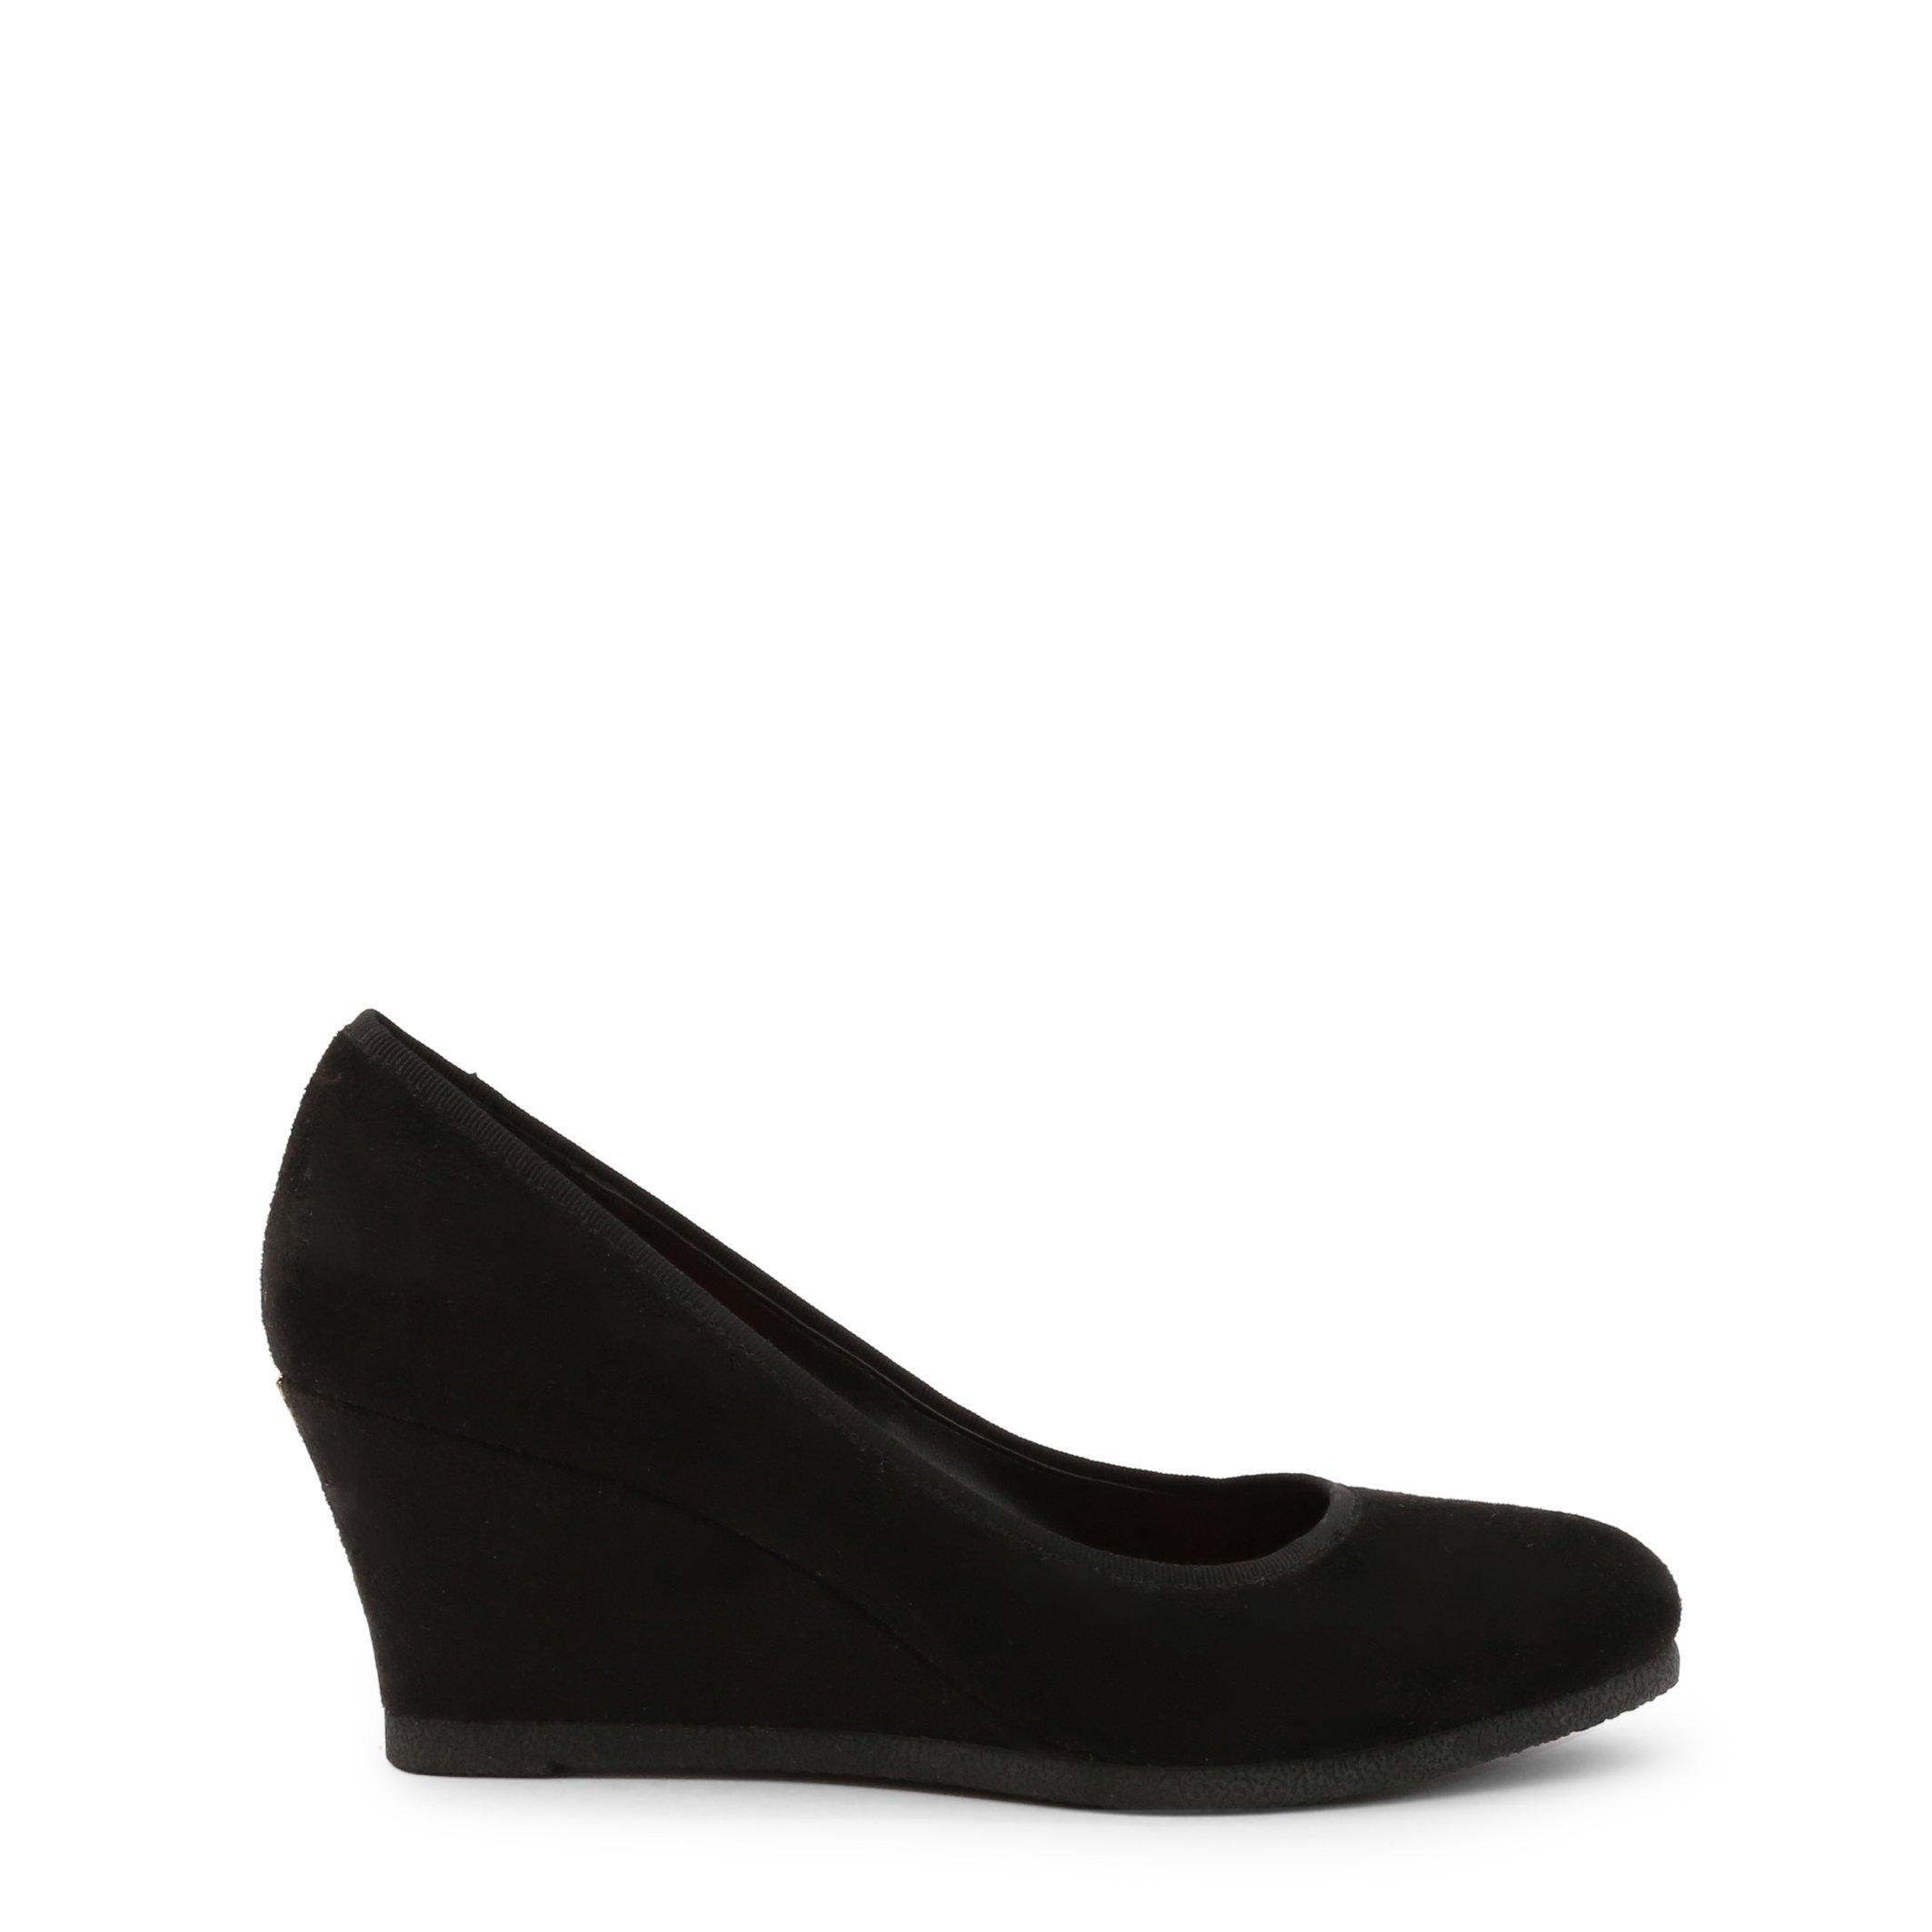 Roccobarocco Women's Wedges Shoe Brown 342946 - black EU 37